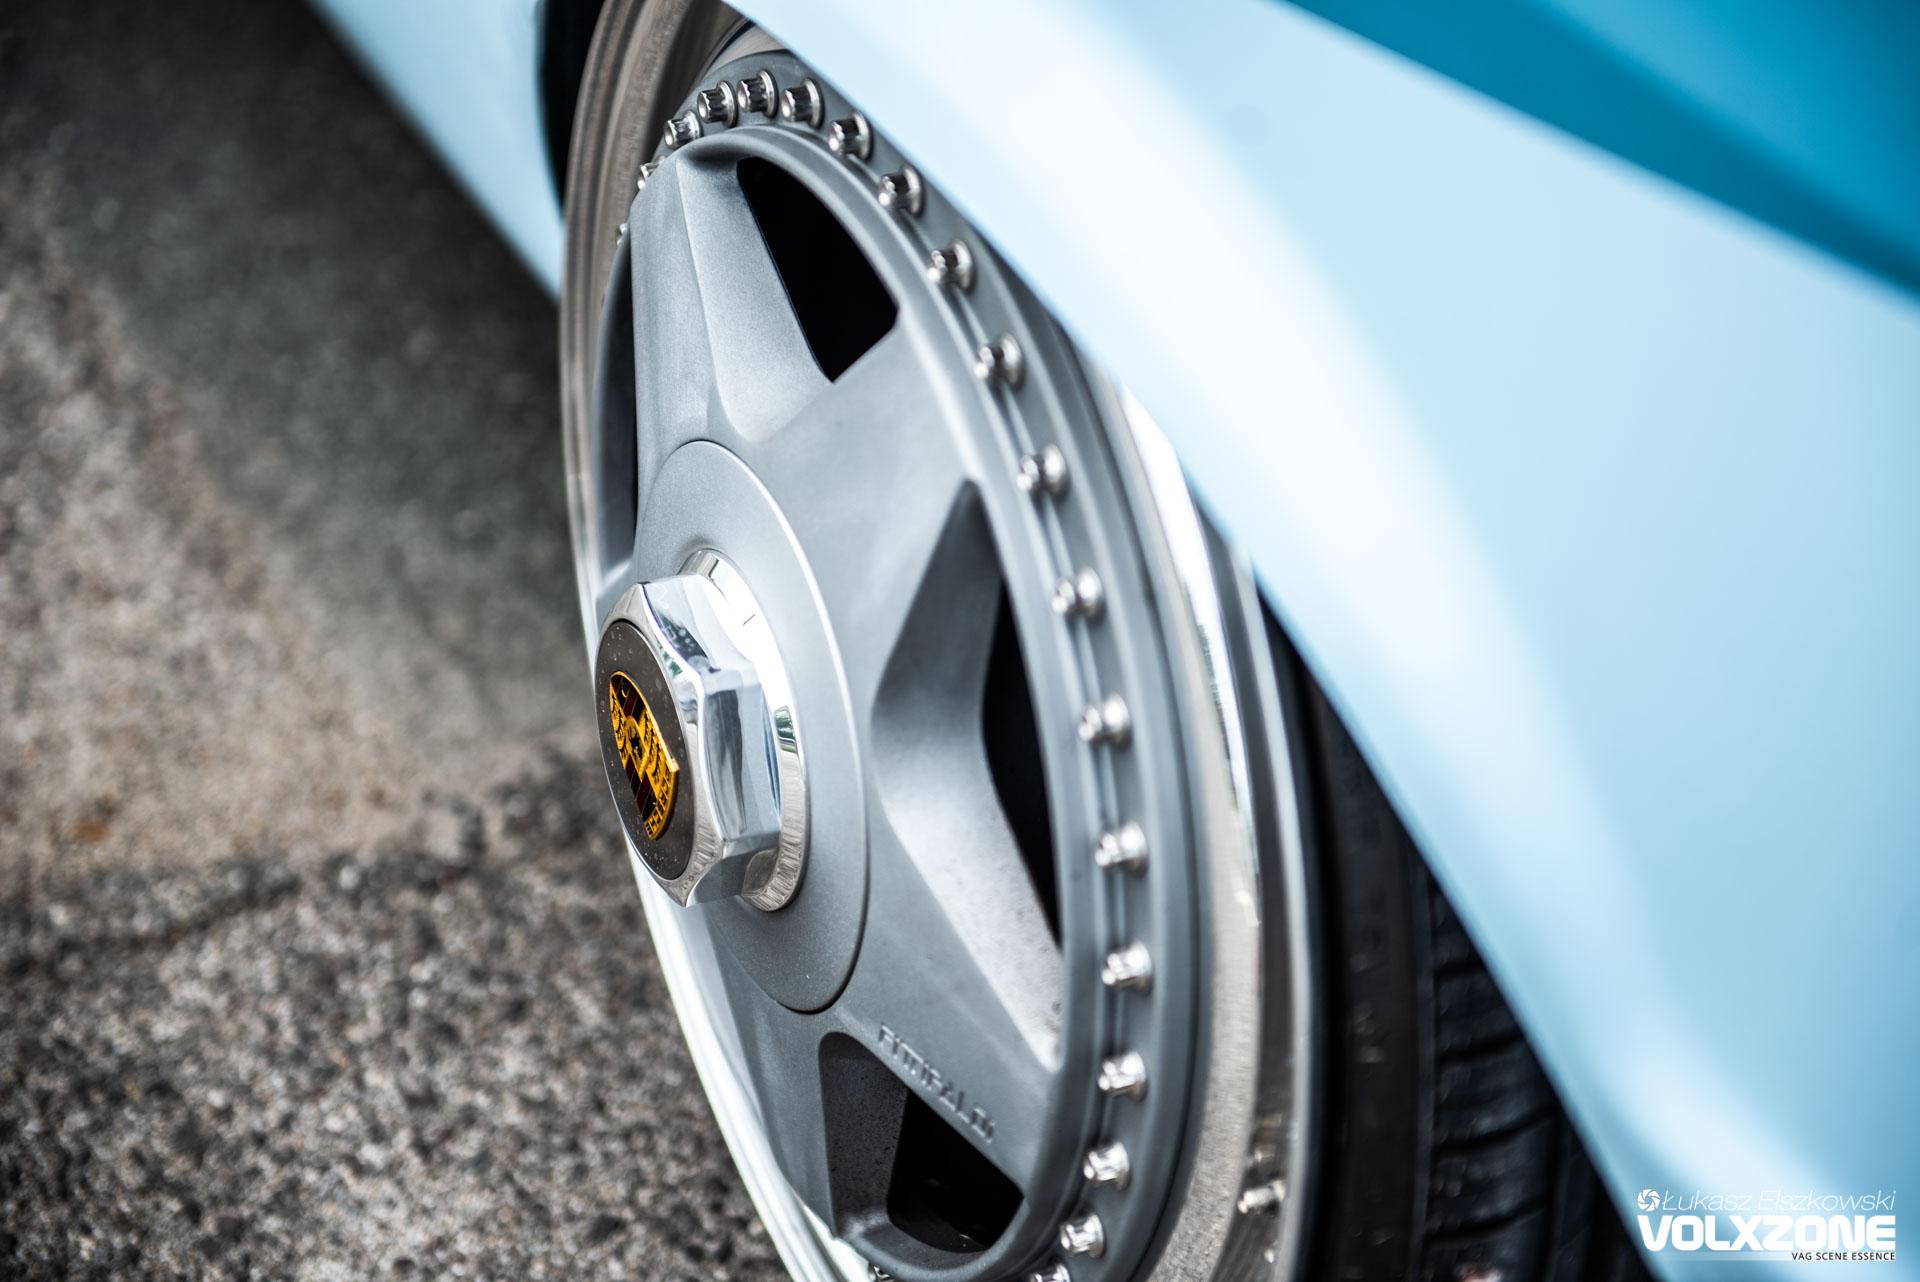 VW Scirocco MK1 2.0 16V Carbon